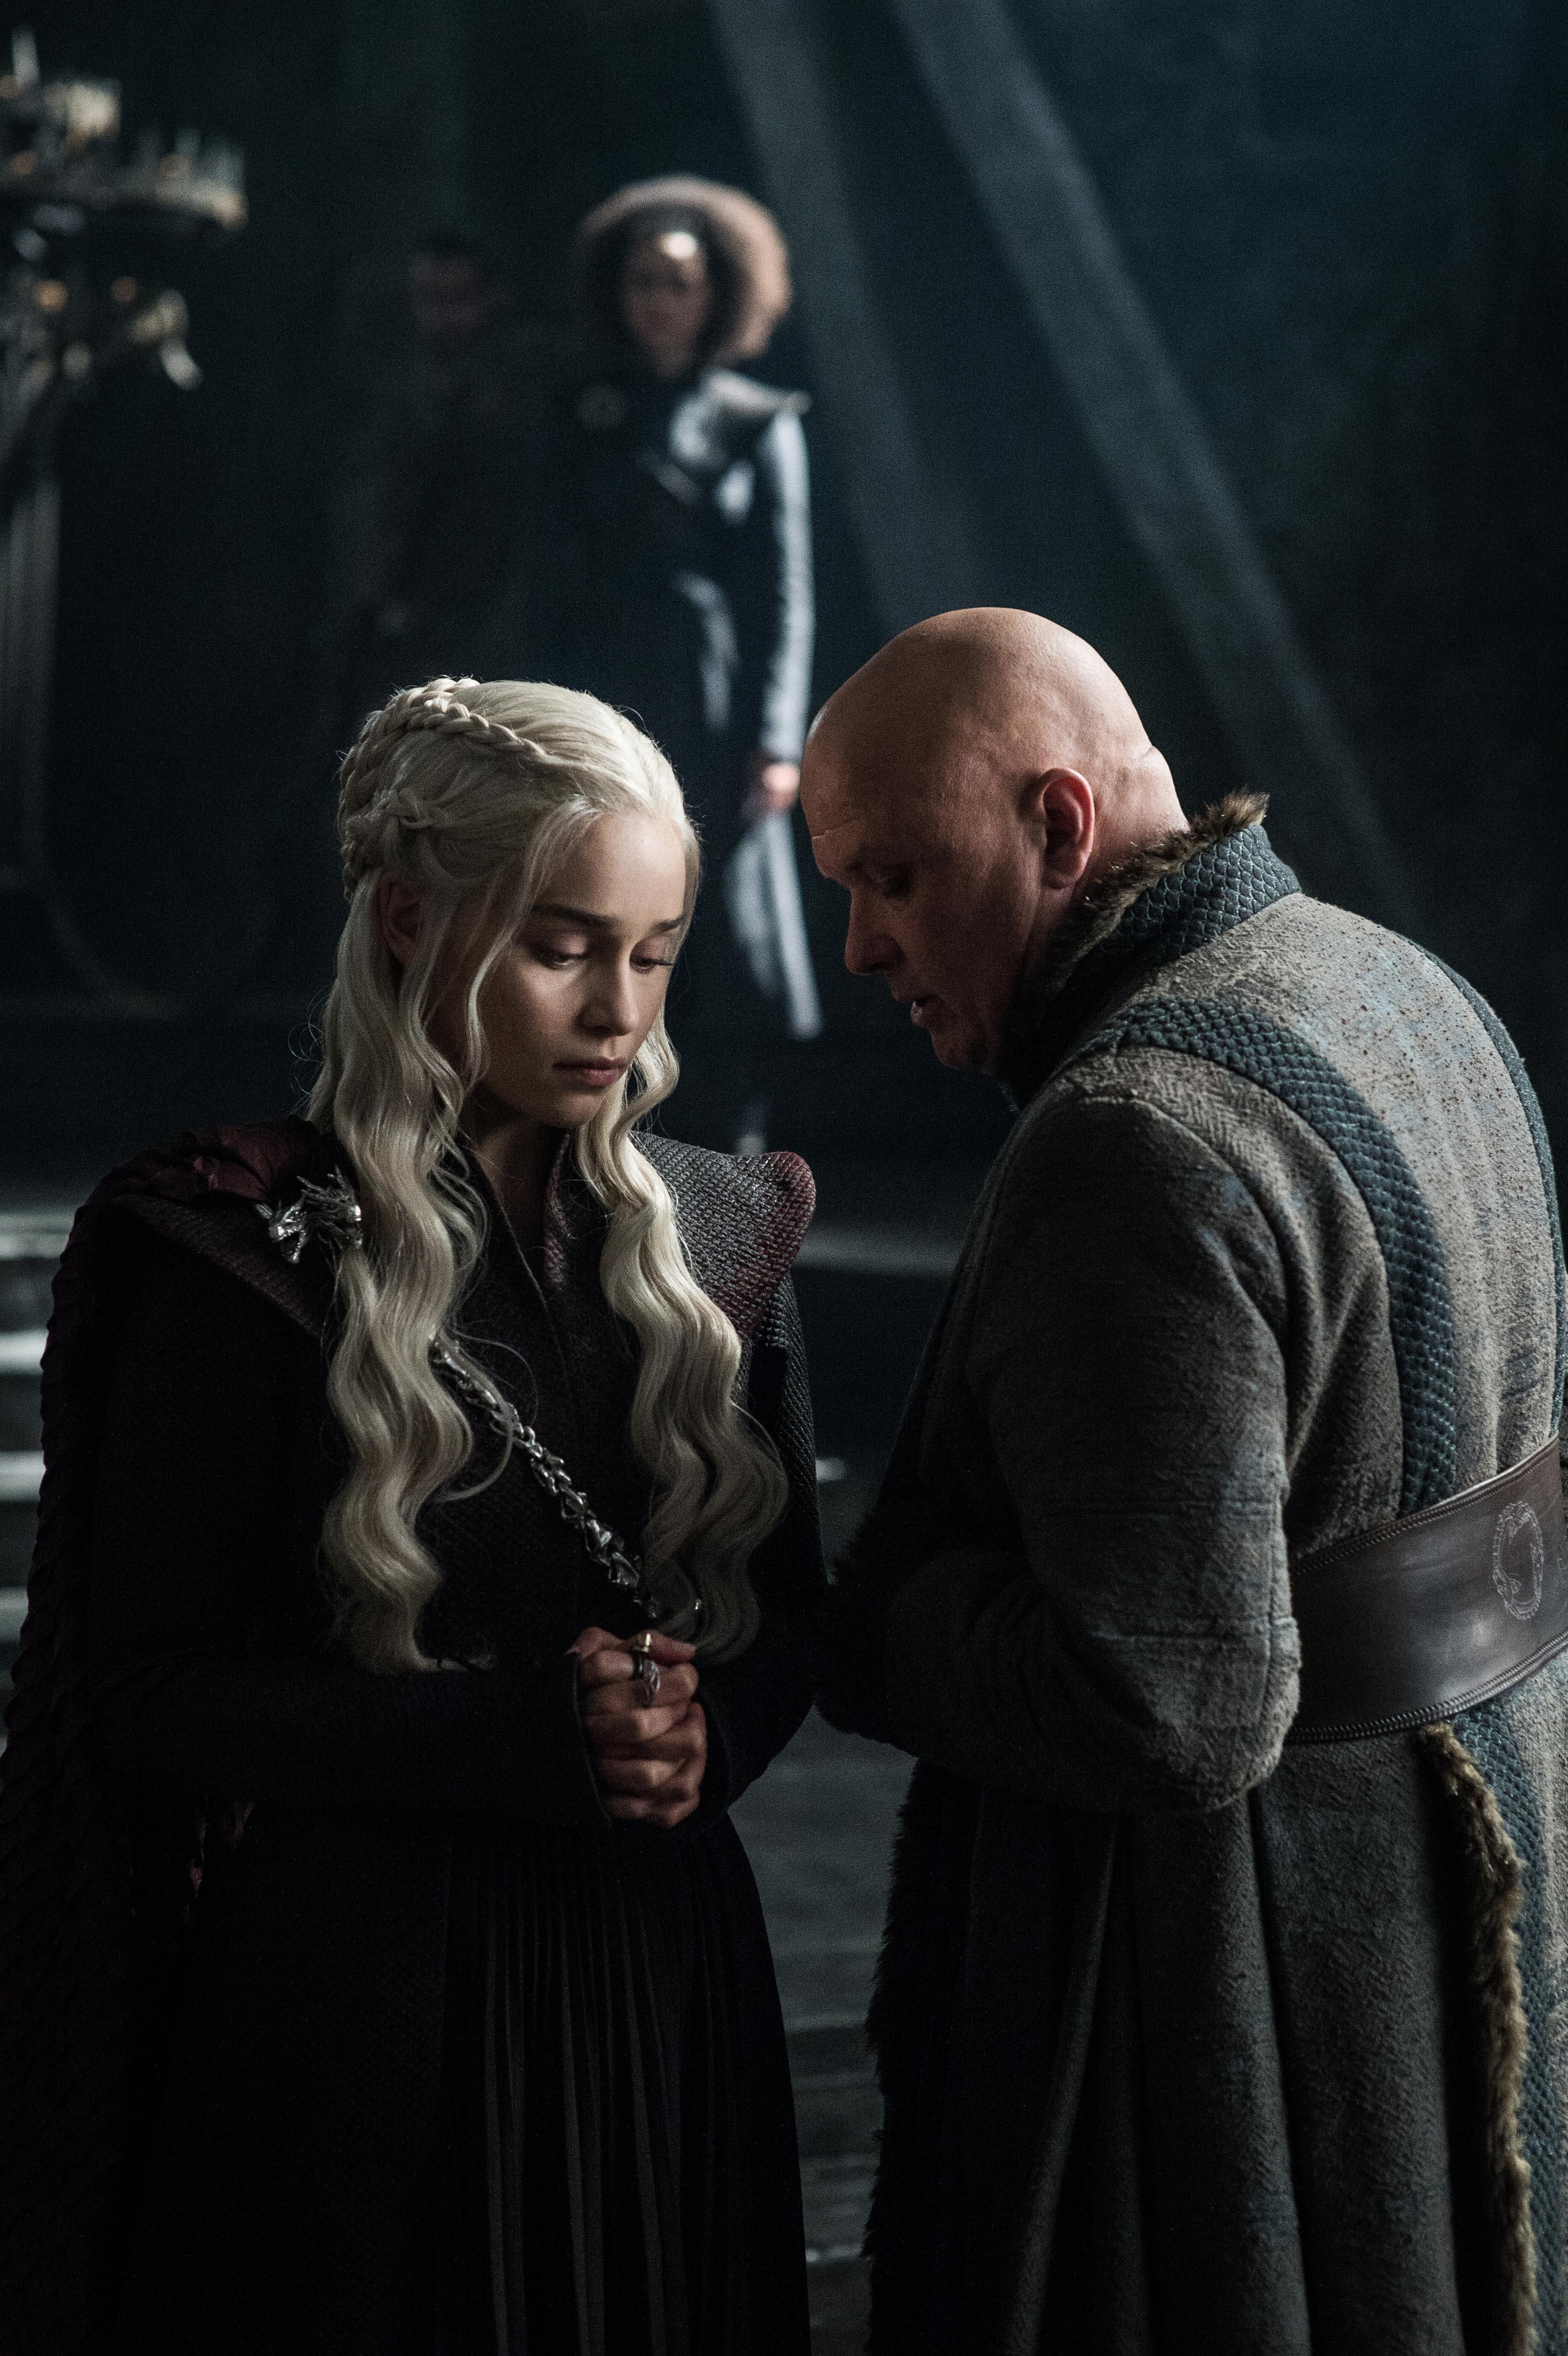 Game of Thrones - Episode 7.03 - The Queen's Justice